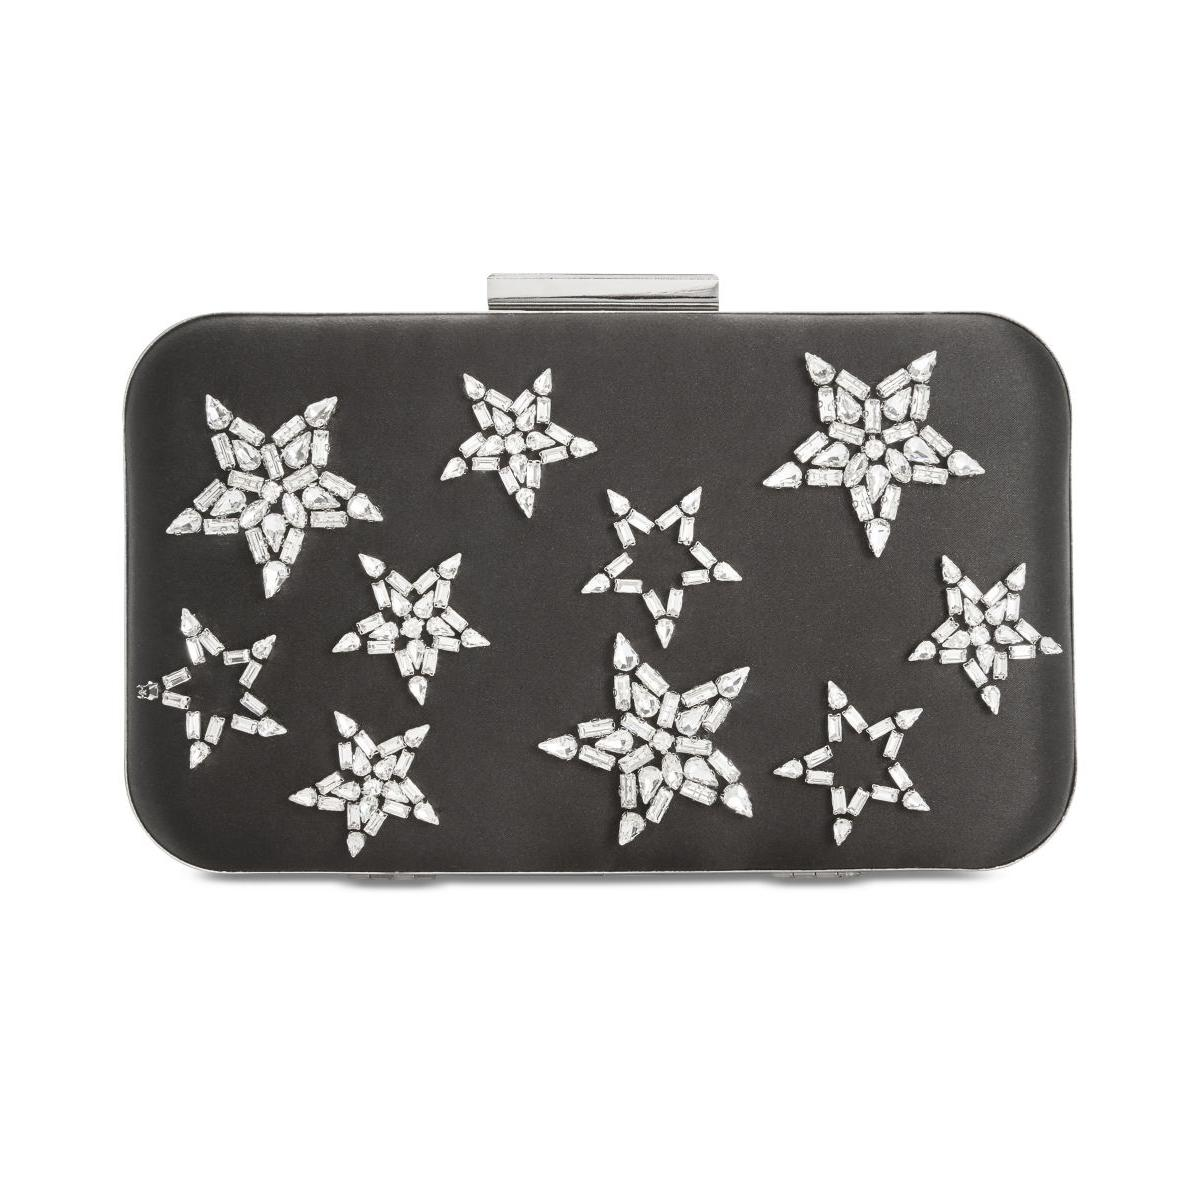 Details About Anna Sui Womens Black Satin Embellished Shoulder Handbag Purse Small Bhfo 9876